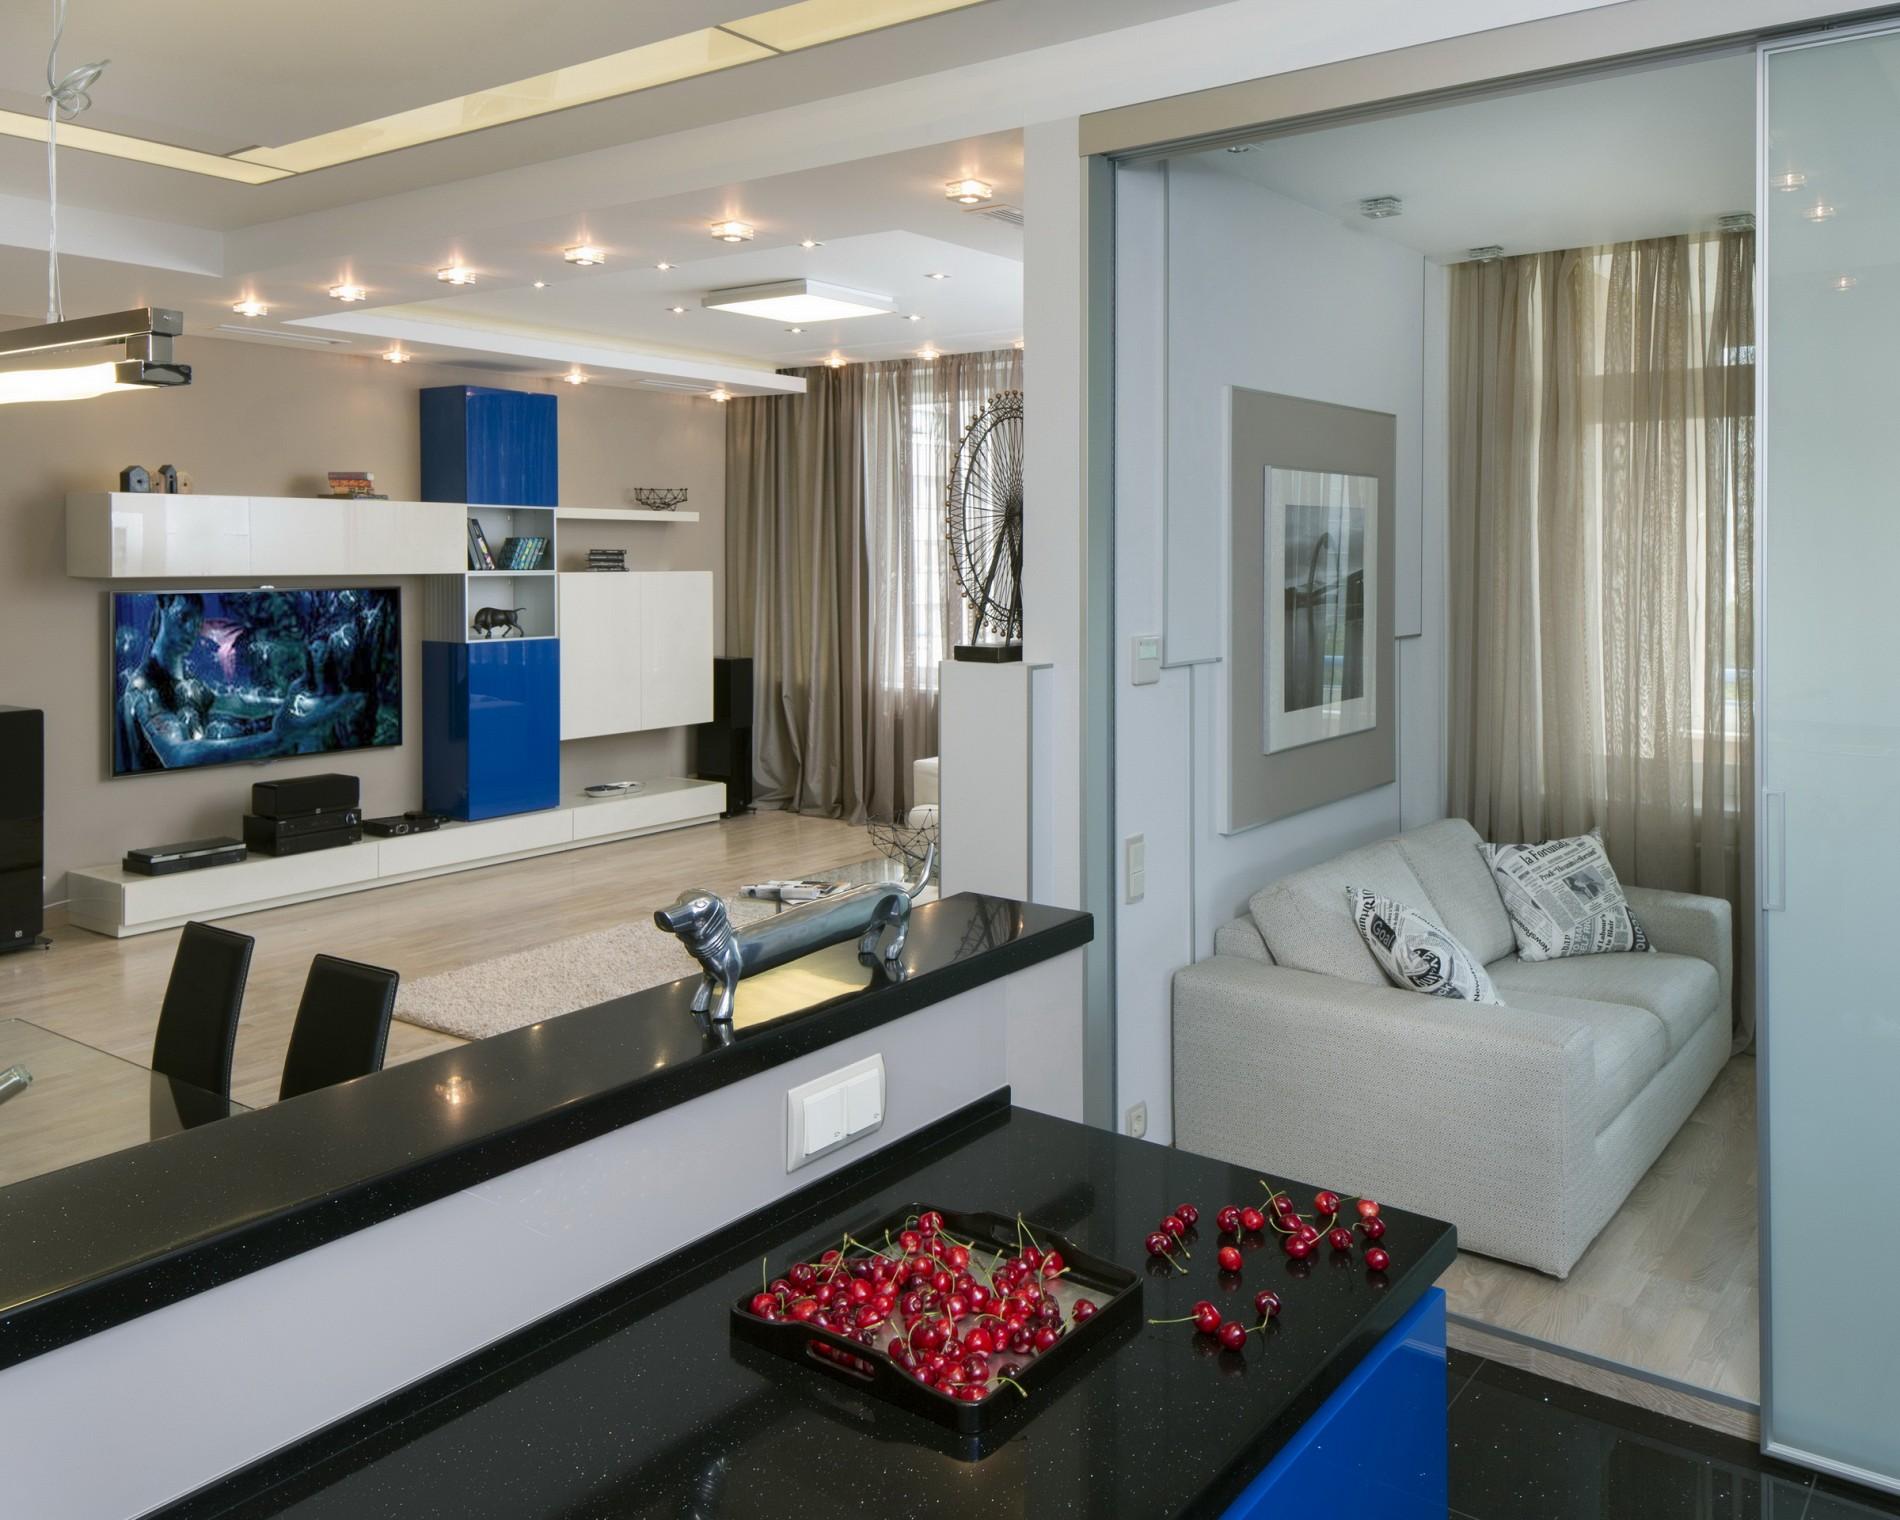 лучший интерьер квартиры в стиле минимализм